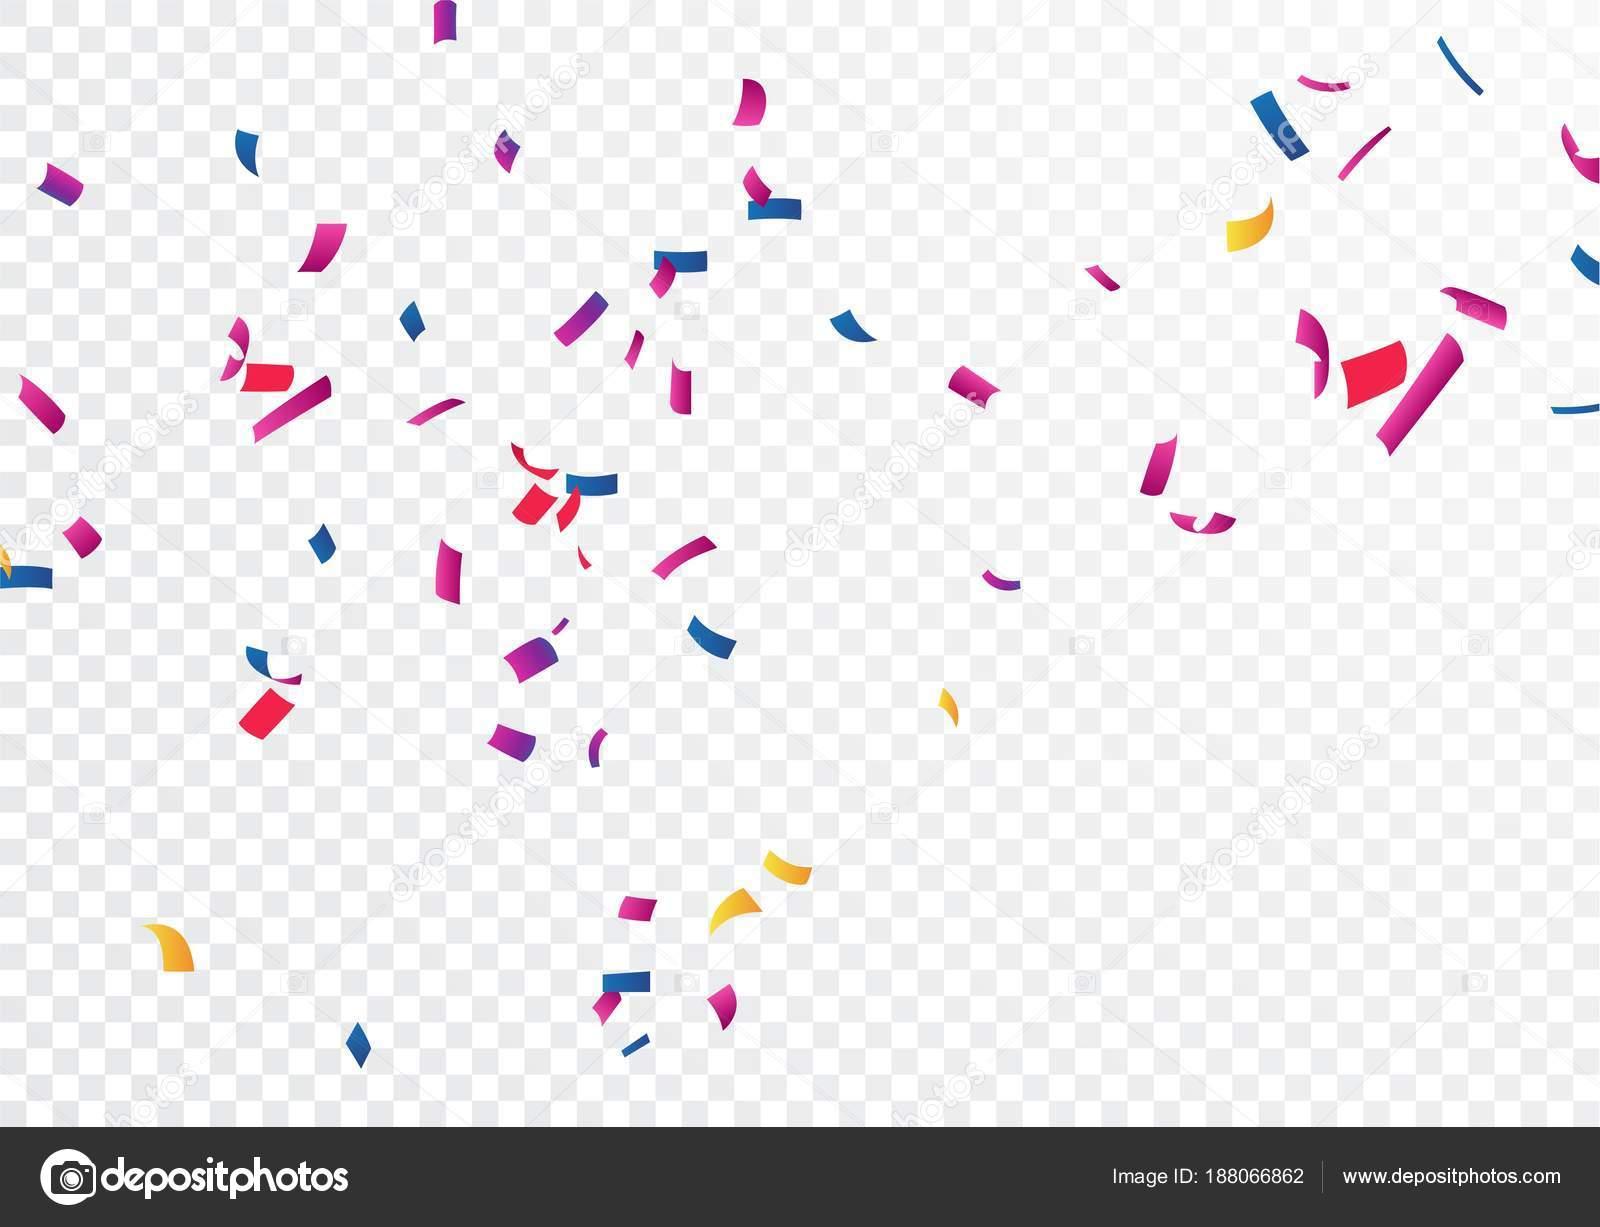 Falling Stars Live Wallpaper Colourful Confetti Transparent Background Stock Vector